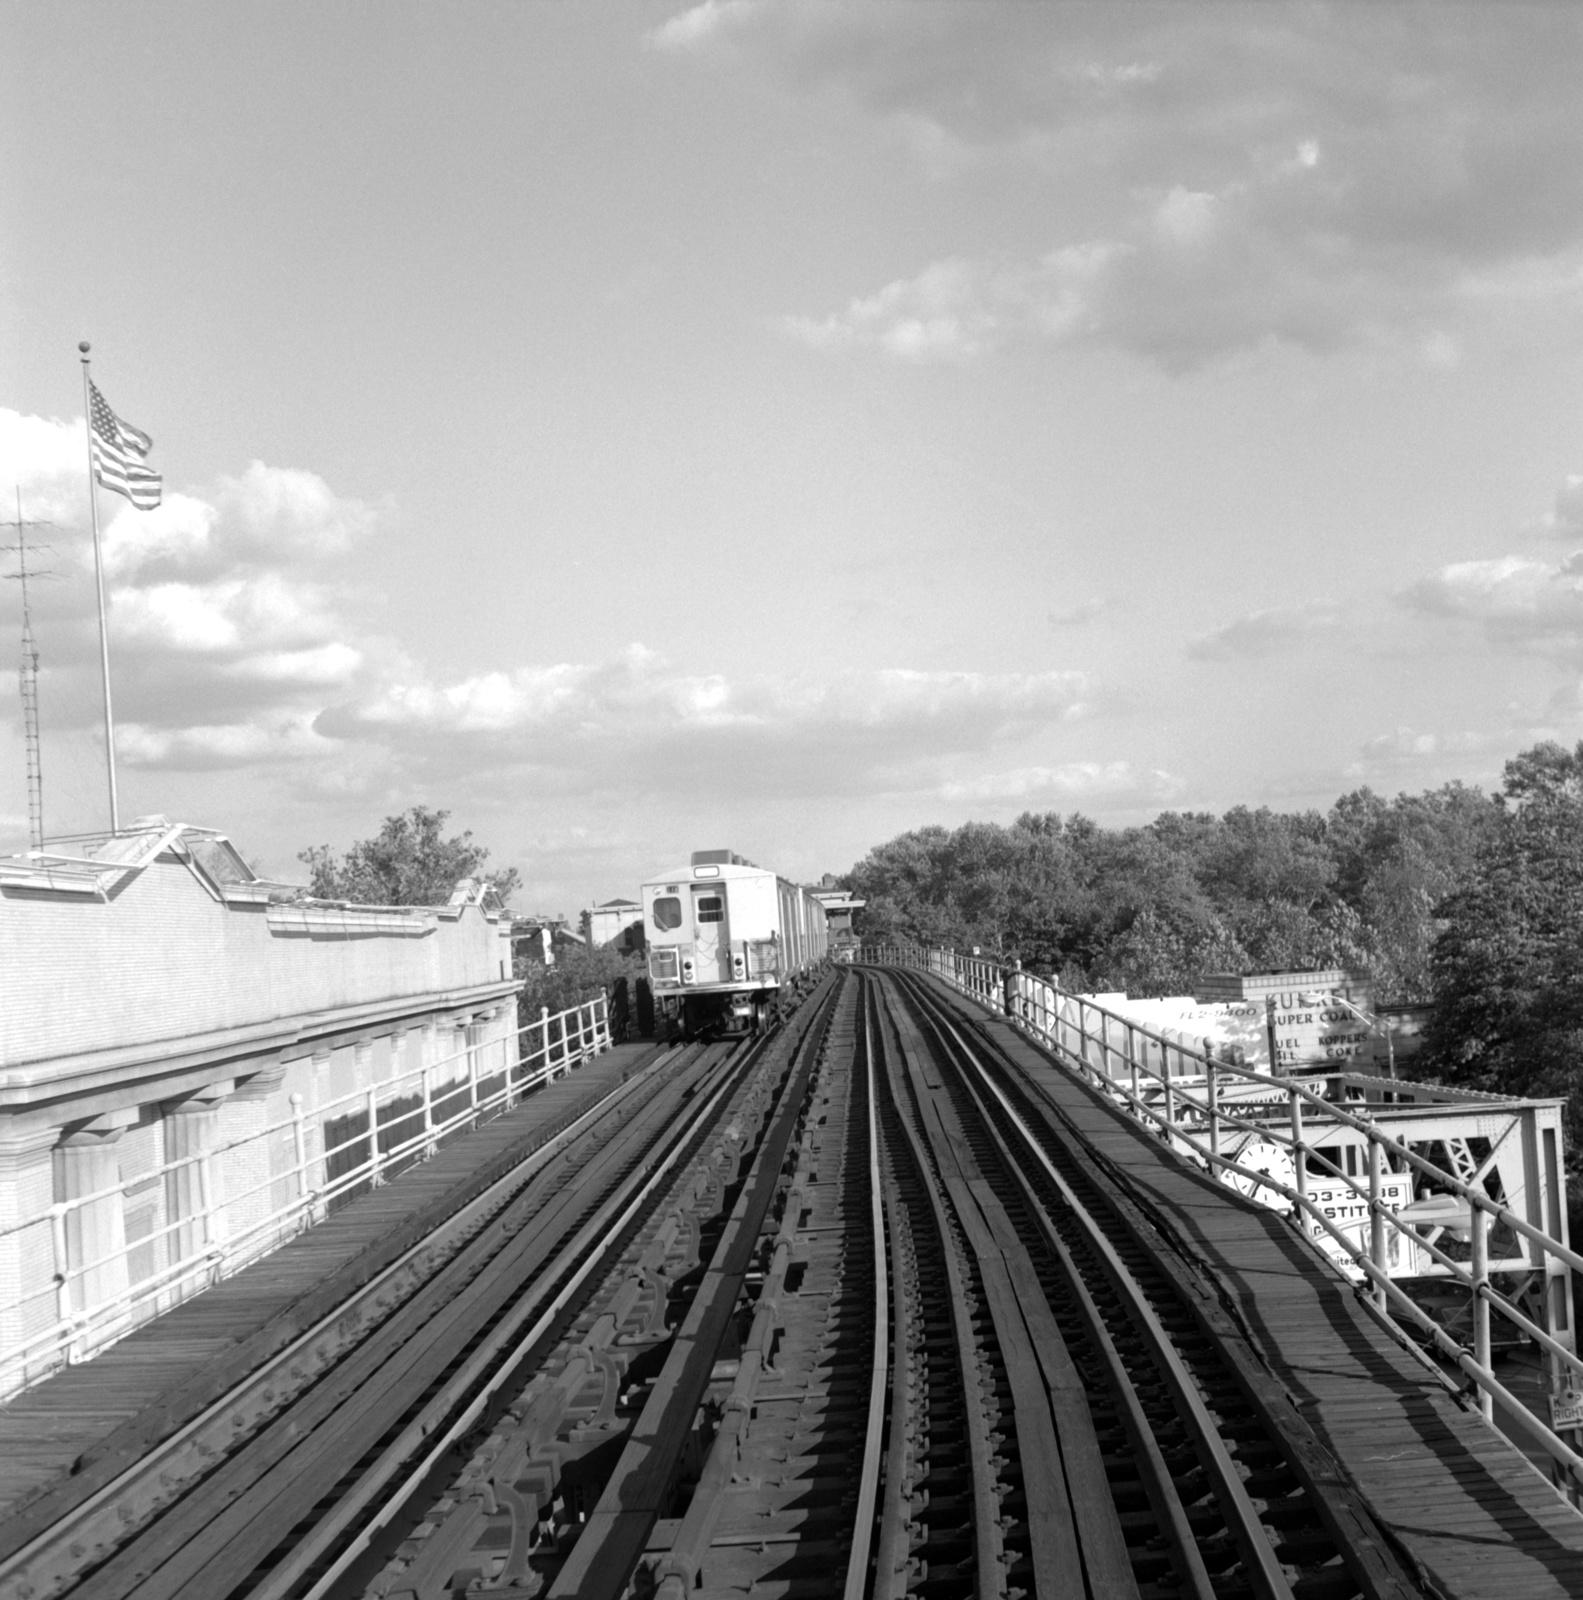 (656k, 1583x1600)<br><b>Country:</b> United States<br><b>City:</b> Philadelphia, PA<br><b>System:</b> SEPTA (or Predecessor)<br><b>Line:</b> Market-Frankford El<br><b>Location:</b> 63rd Street<br><b>Car:</b> SEPTA M-3 (Budd, 1960)  <br><b>Collection of:</b> David Pirmann<br><b>Date:</b> 10/5/1968<br><b>Viewed (this week/total):</b> 0 / 55